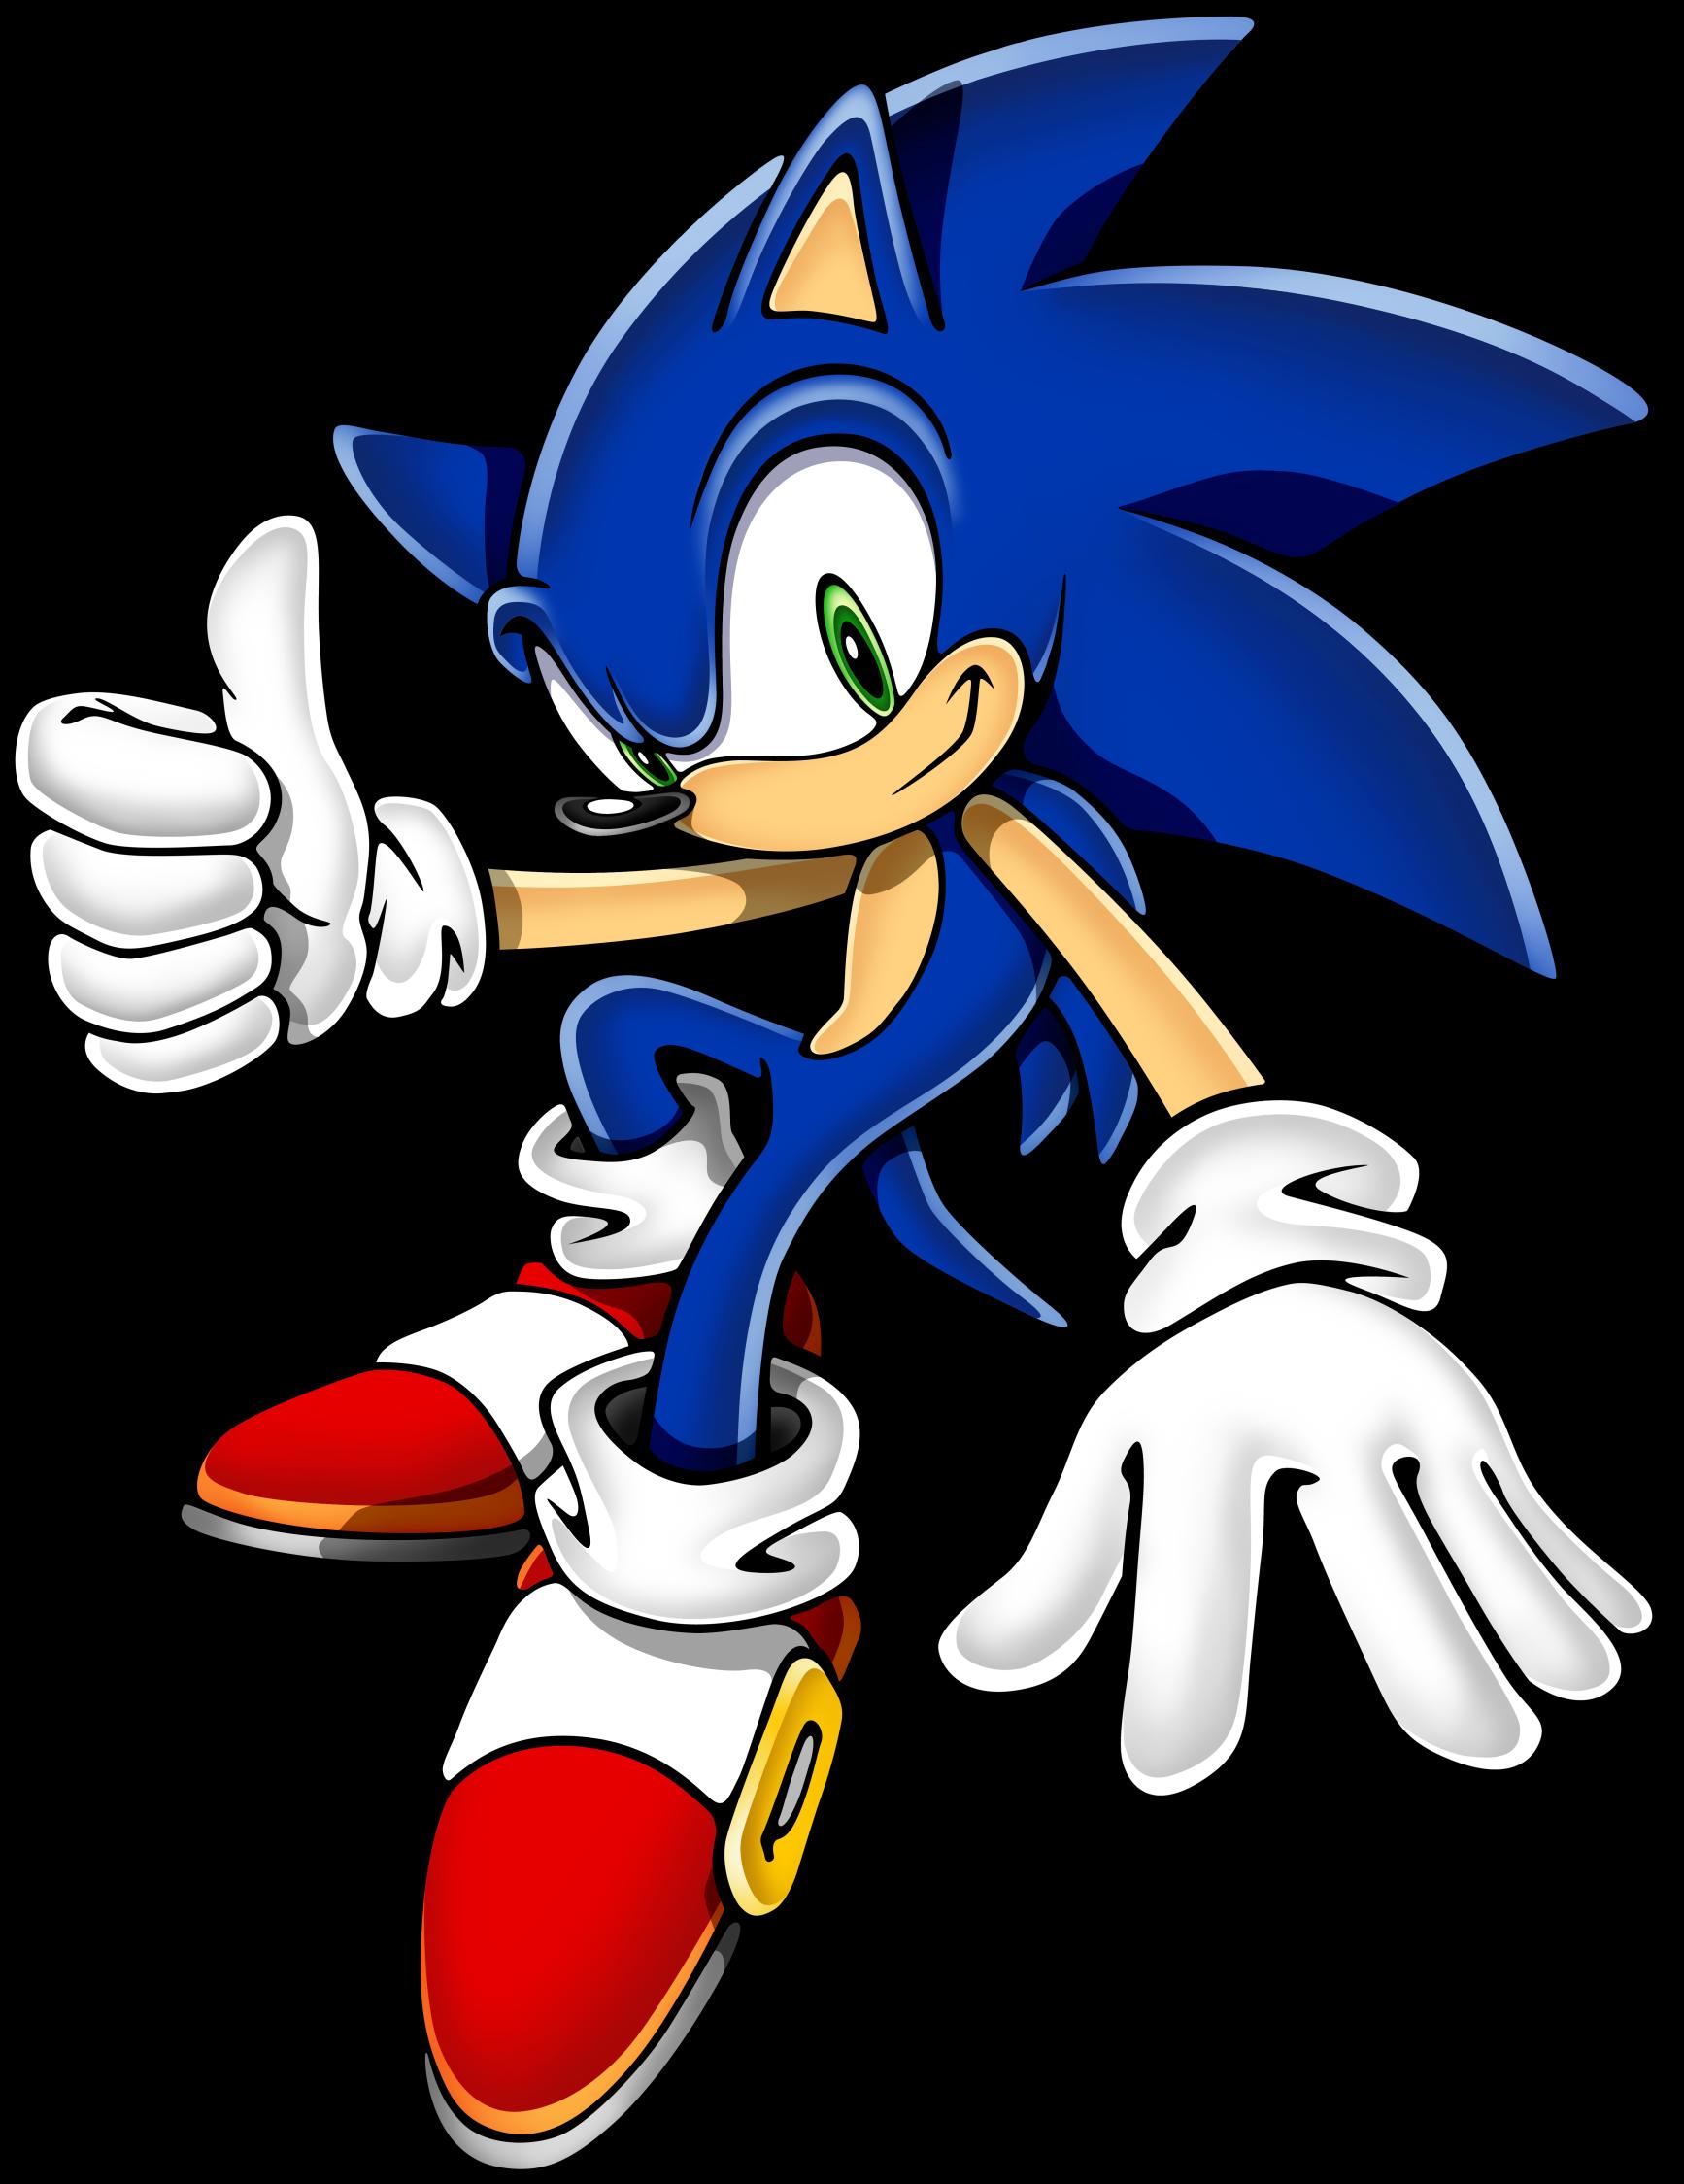 Sonic art assets dvd. Hedgehog clipart happy birthday